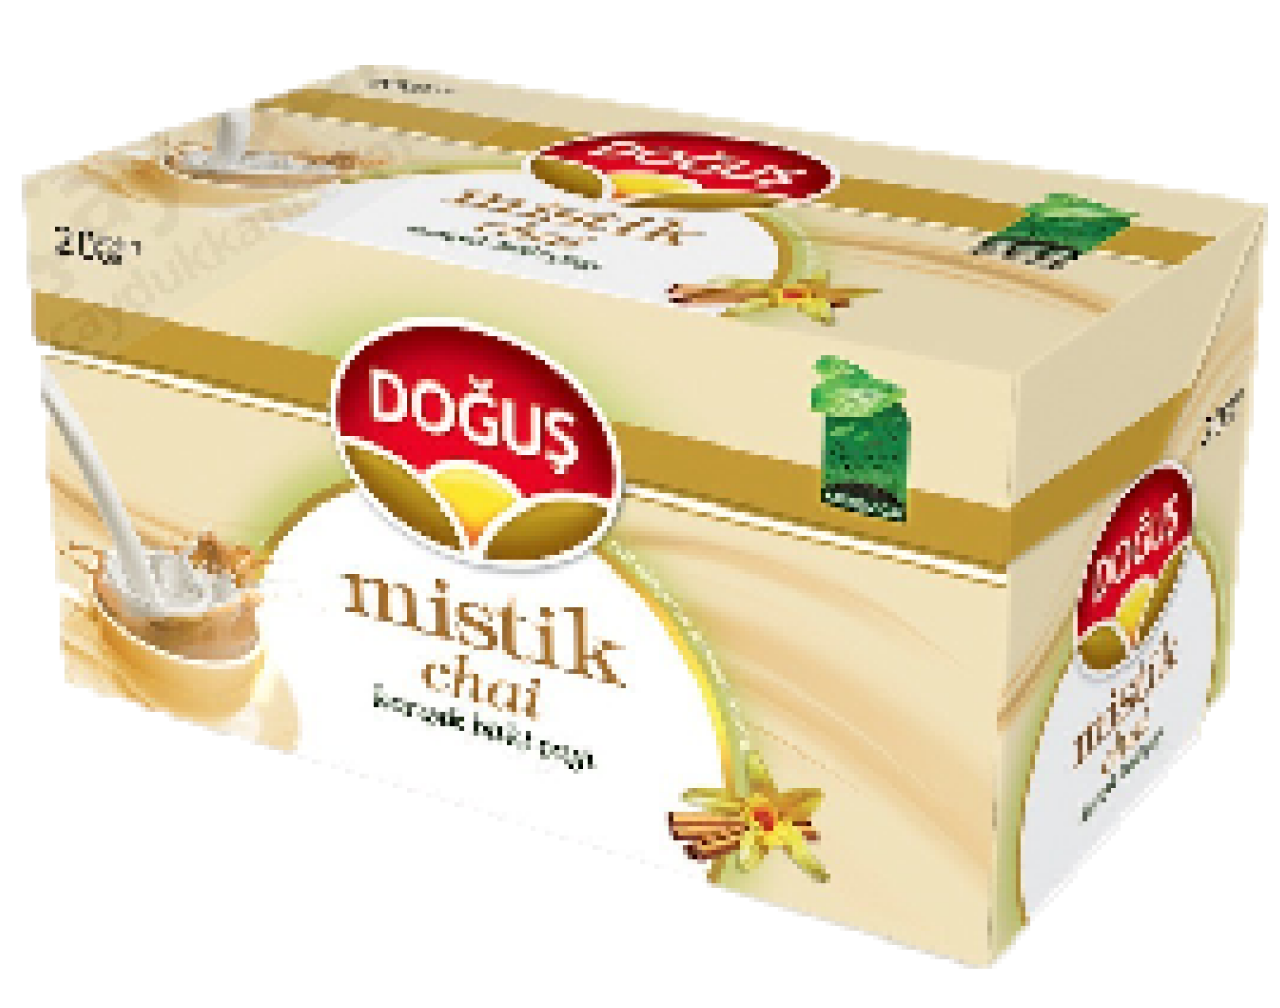 DOGUS MISTIK CAY 20'ER (tisane mystique)